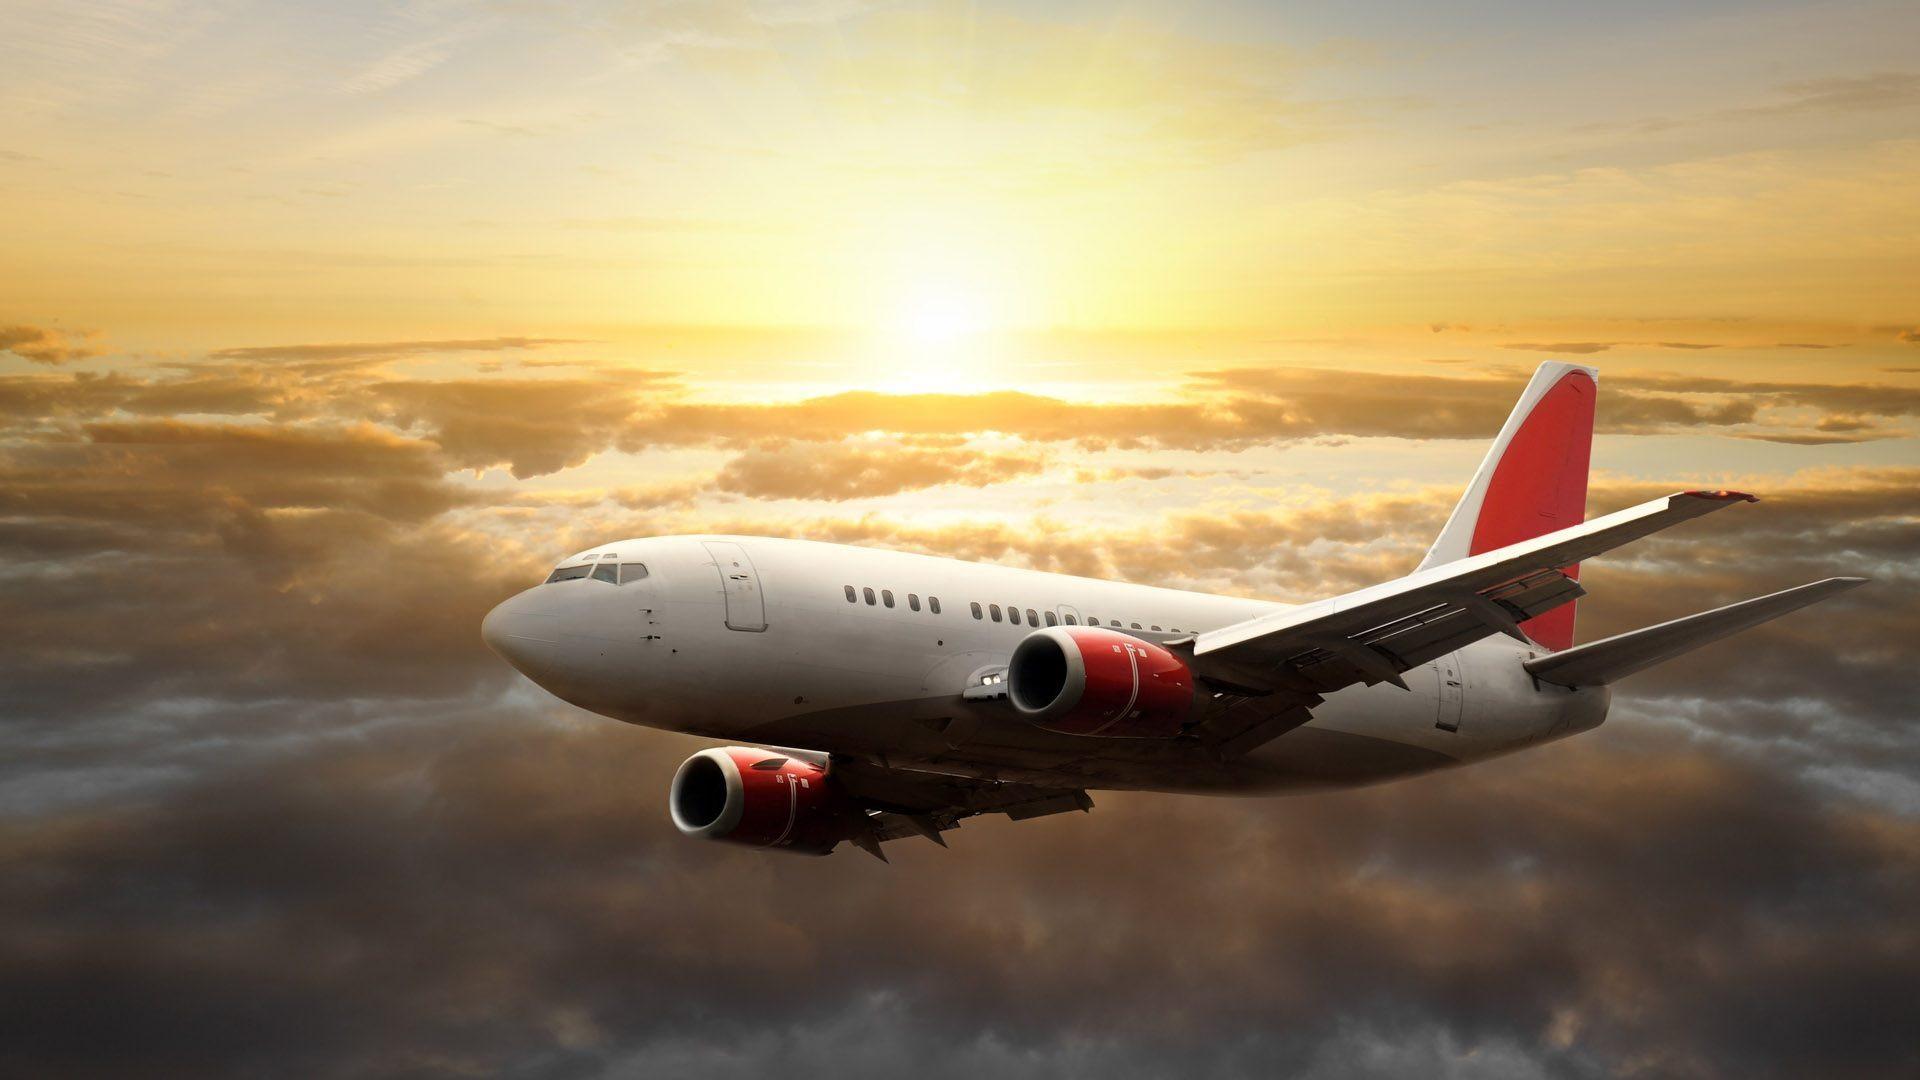 avion-comercial-3d-en-pleno-vuelo.jpg